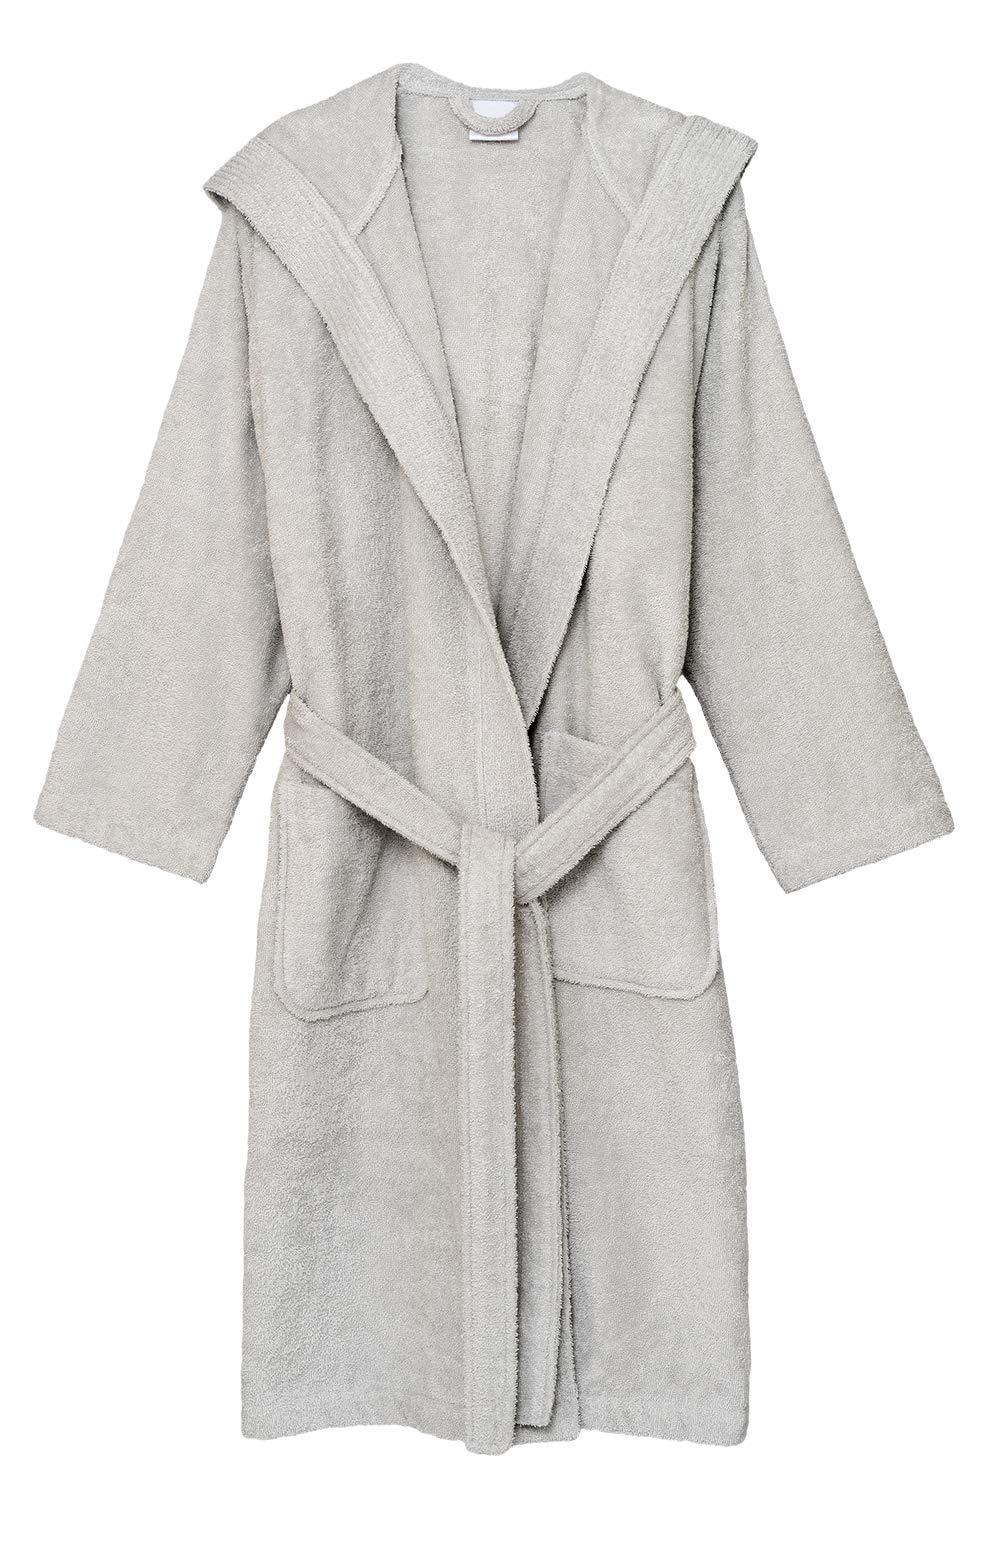 TowelSelections Men's Hooded Robe, Cotton Terry Cloth Bathrobe Medium Glacier Gray